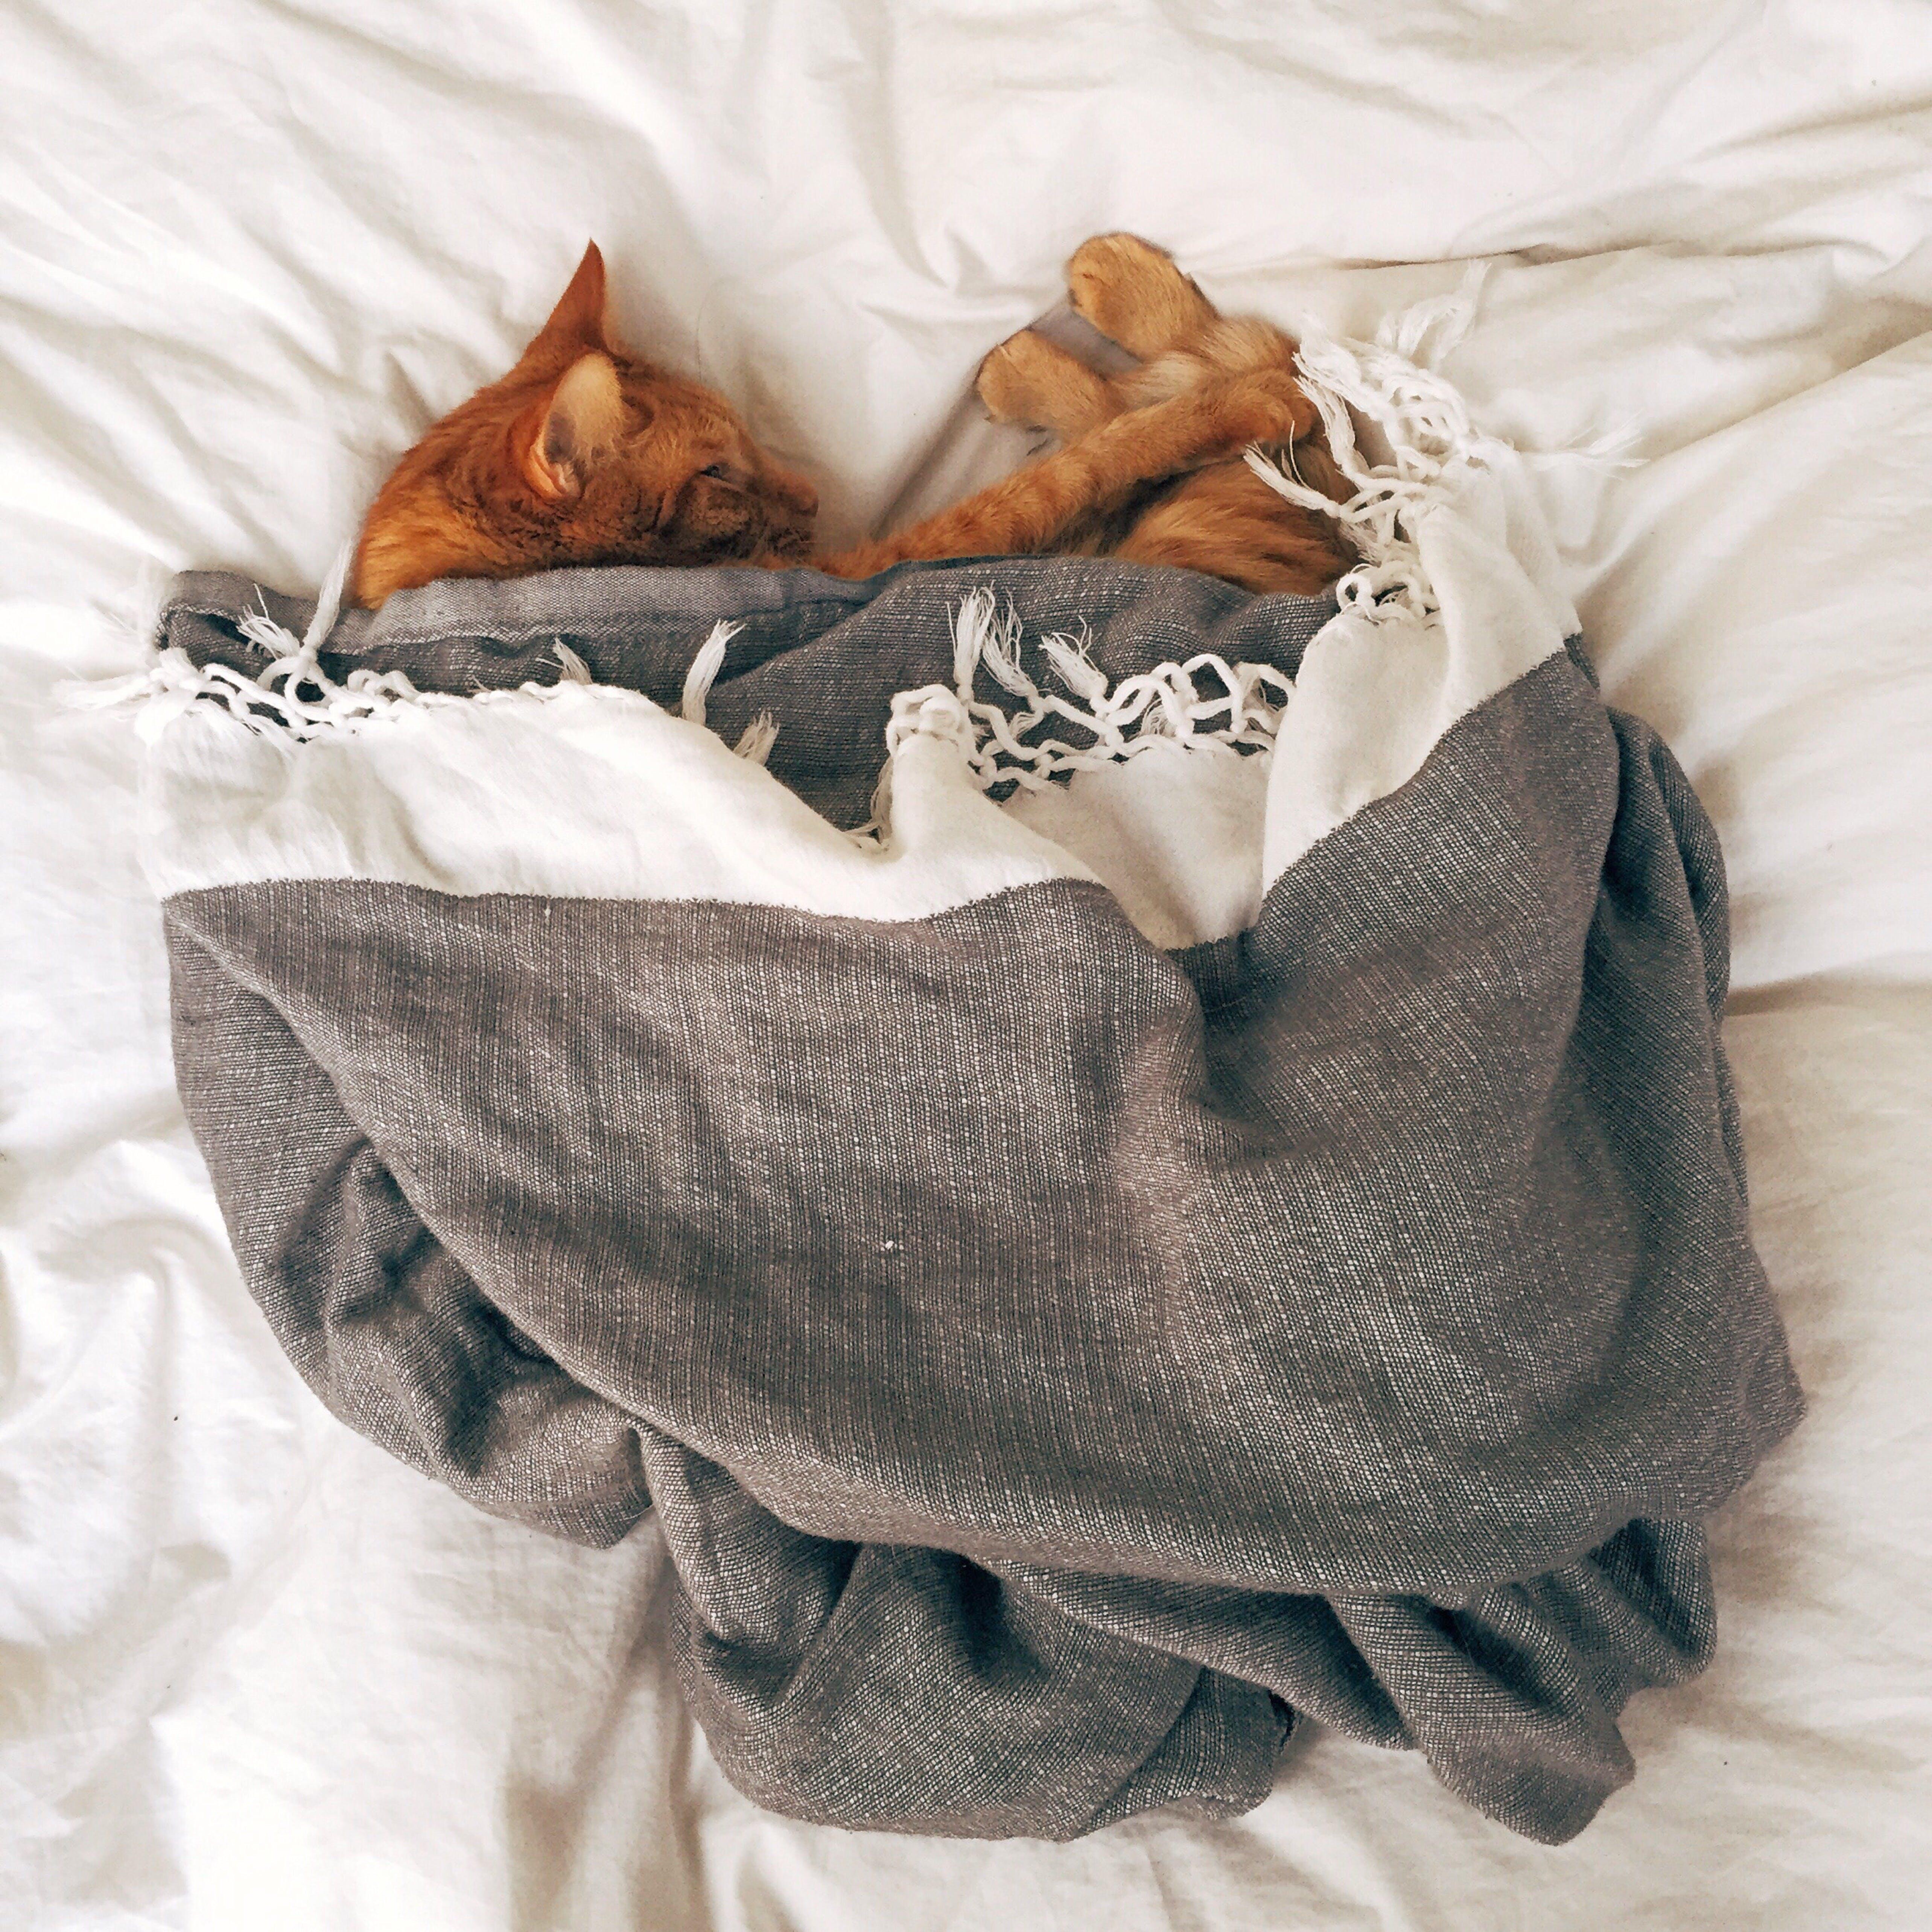 Orange Tabby Cat Sleeping on White Textile